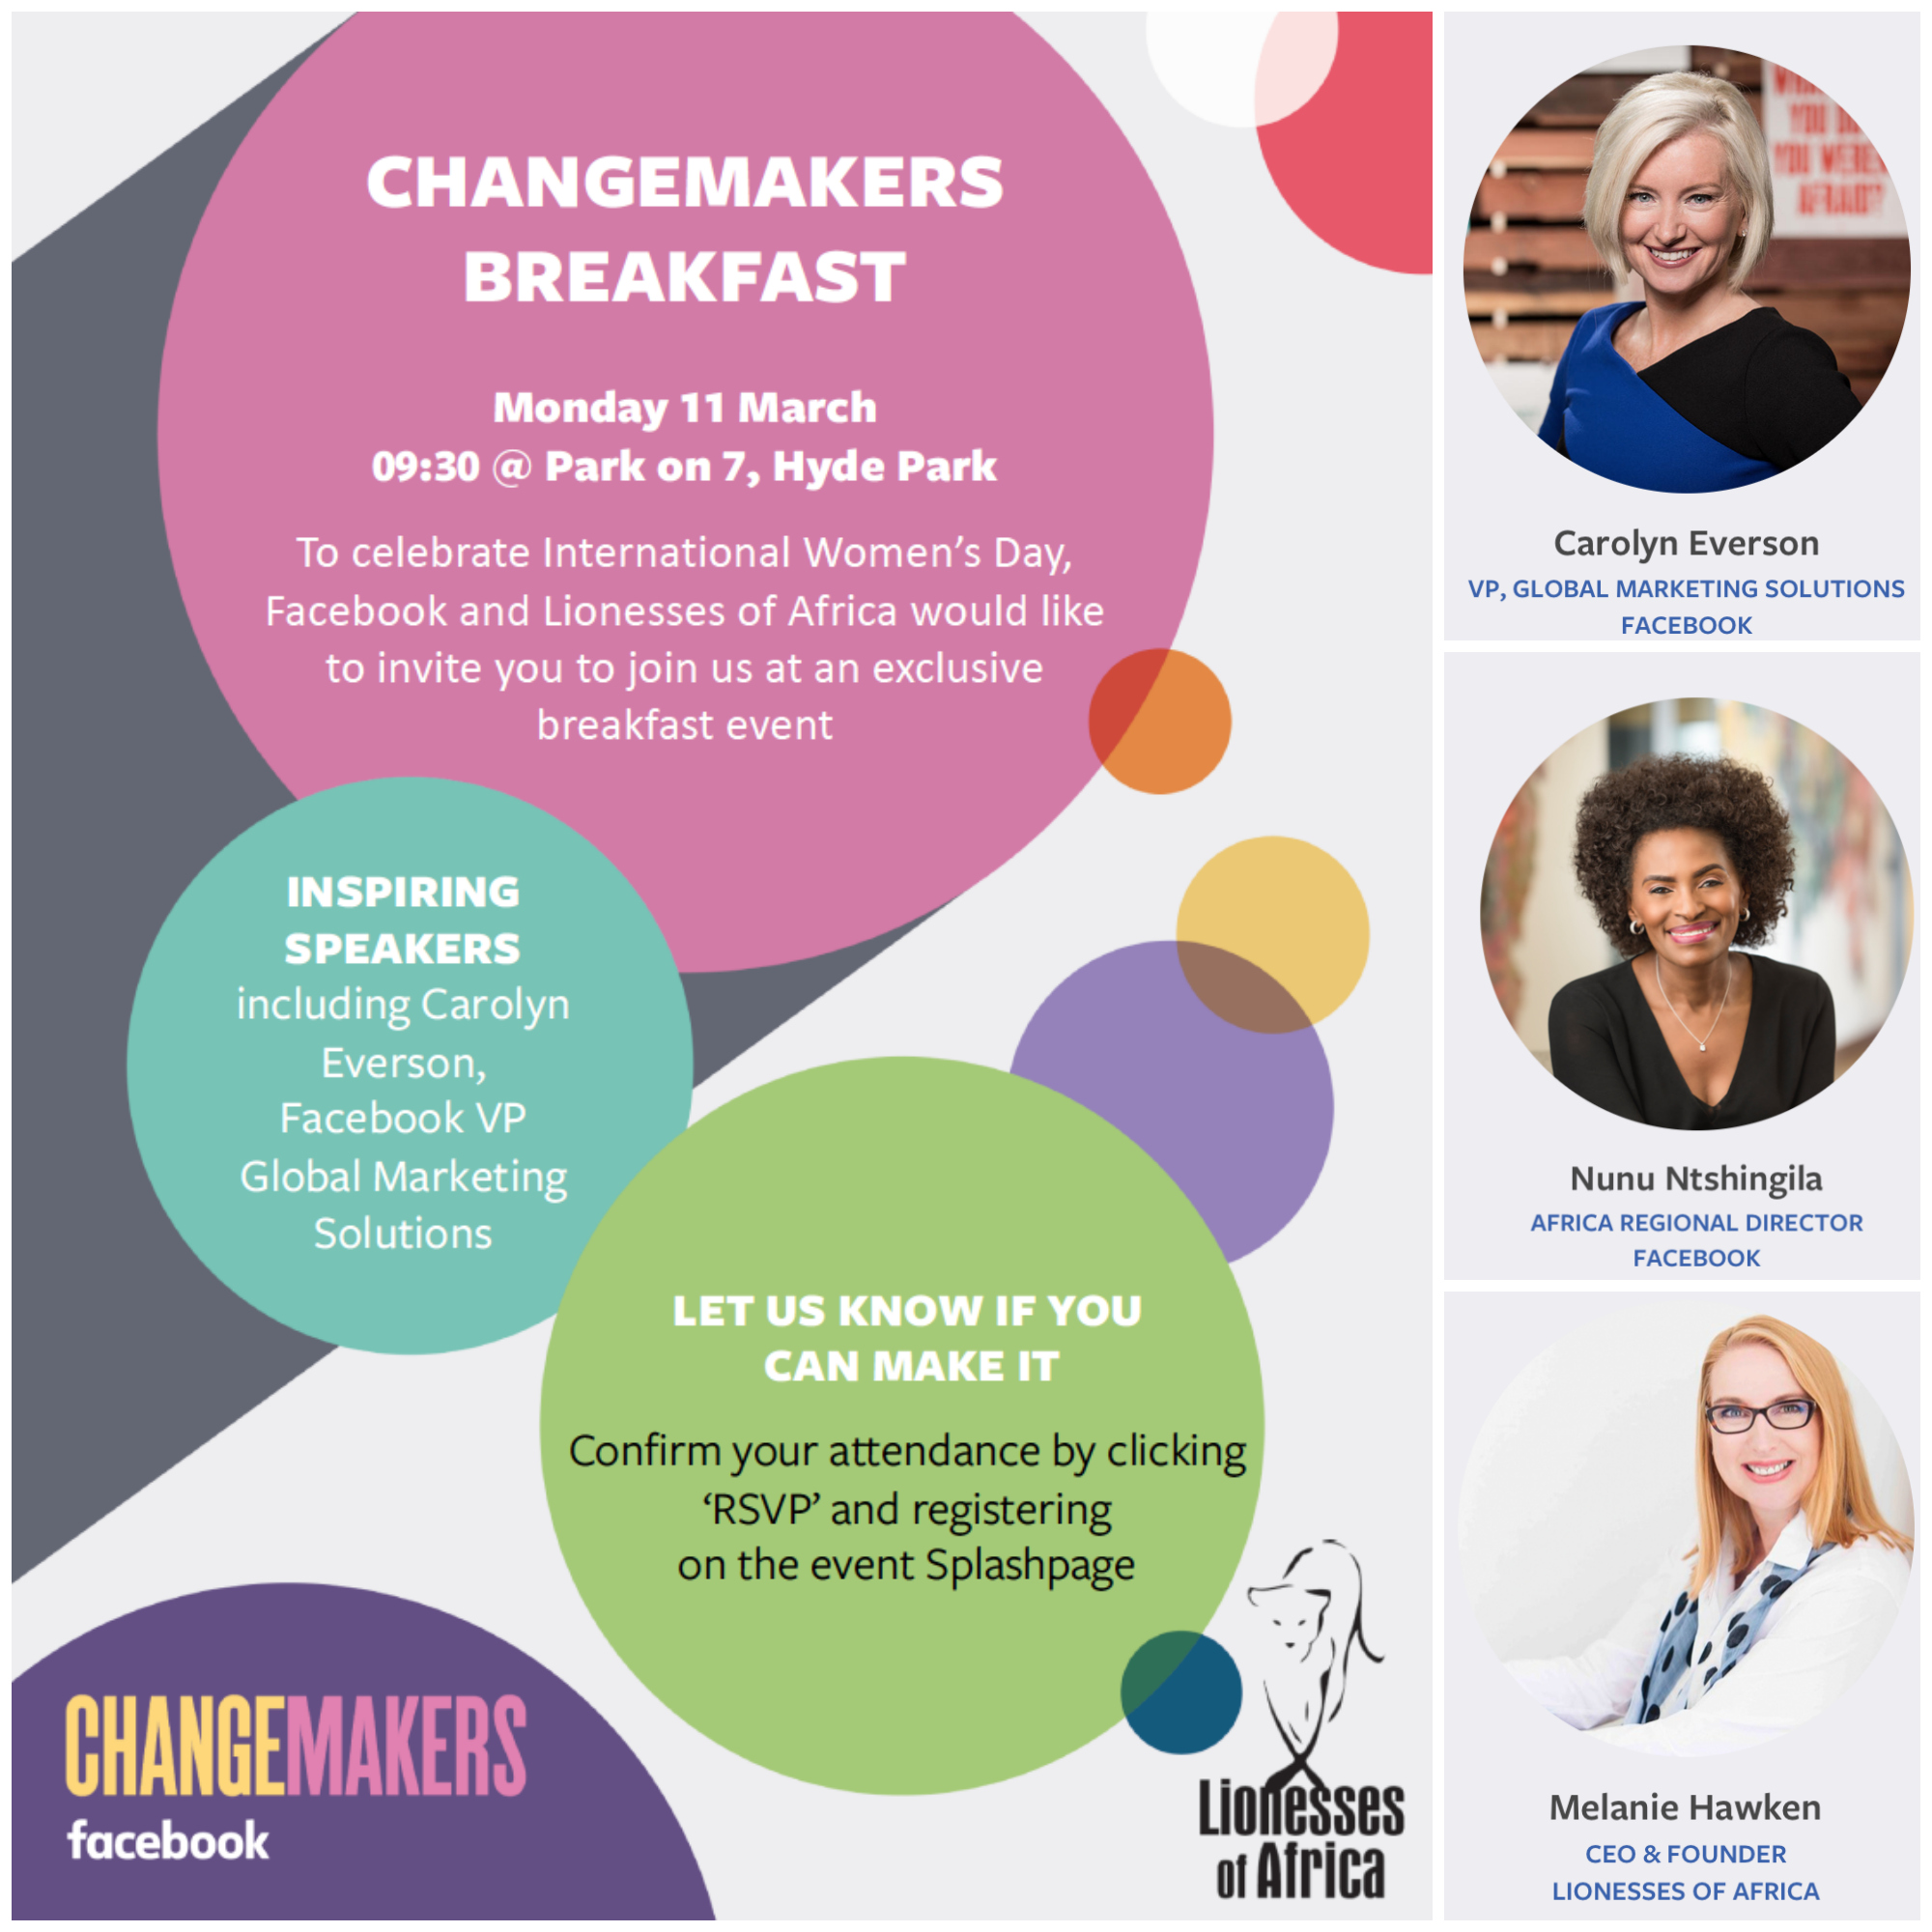 Changemakers-Breakfast-Collage.jpg